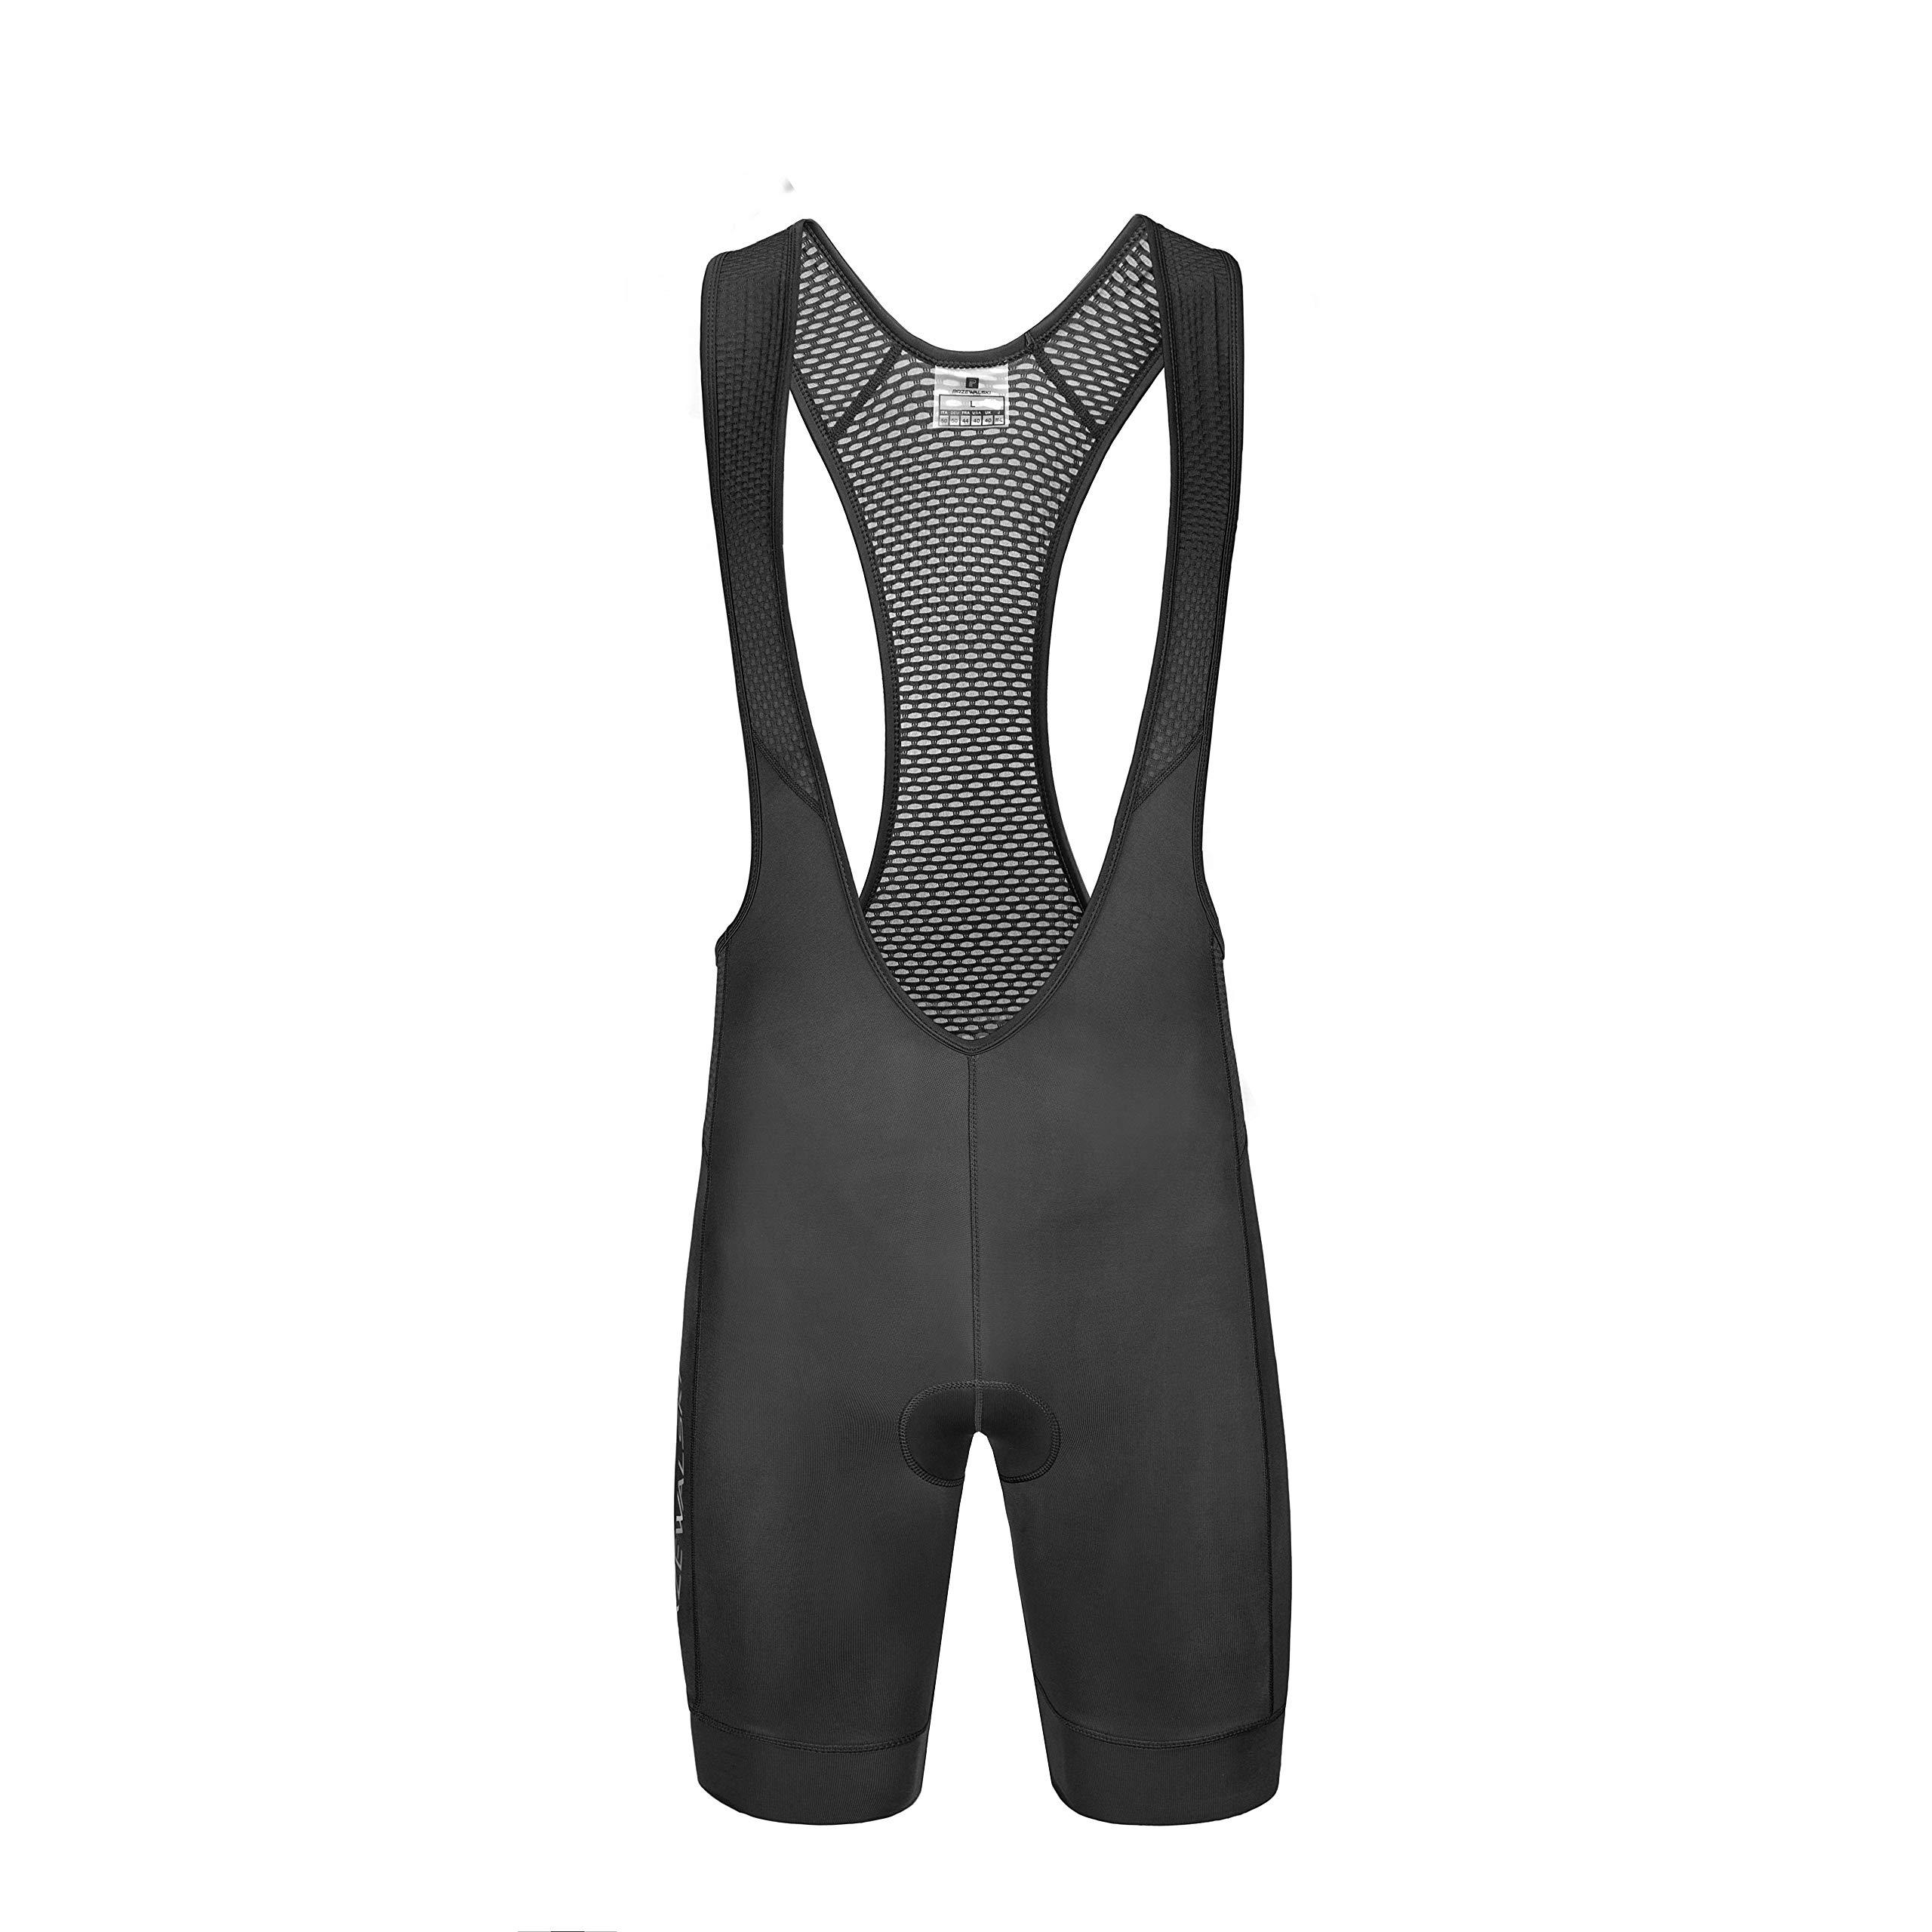 Przewalski Men's Cycling Bib Shorts, 4D Padded Compression Bike Tights Breathable Bicycle Pants UPF 50+, Classic Series, Black/XL by Przewalski (Image #3)